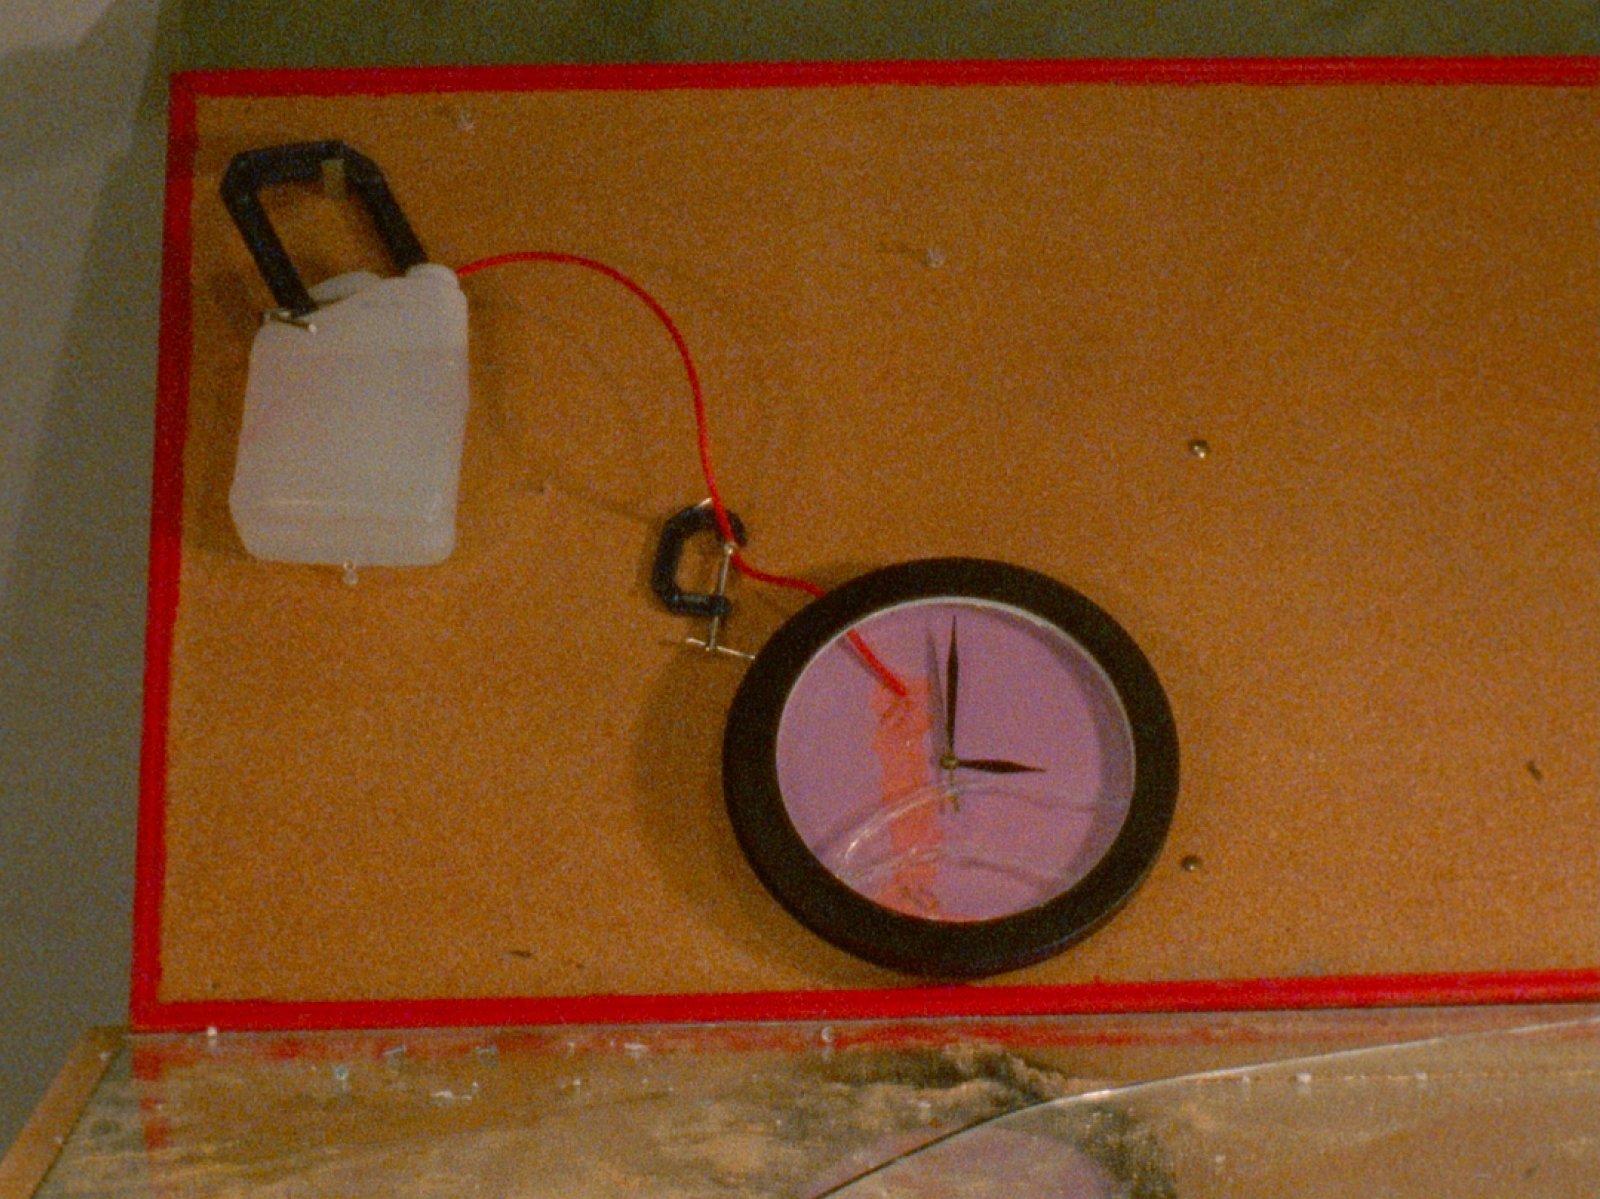 Julia Feyrer,Dailies(still), 2012, 16mm film loop, silent, 20 minutes, dimensions variable